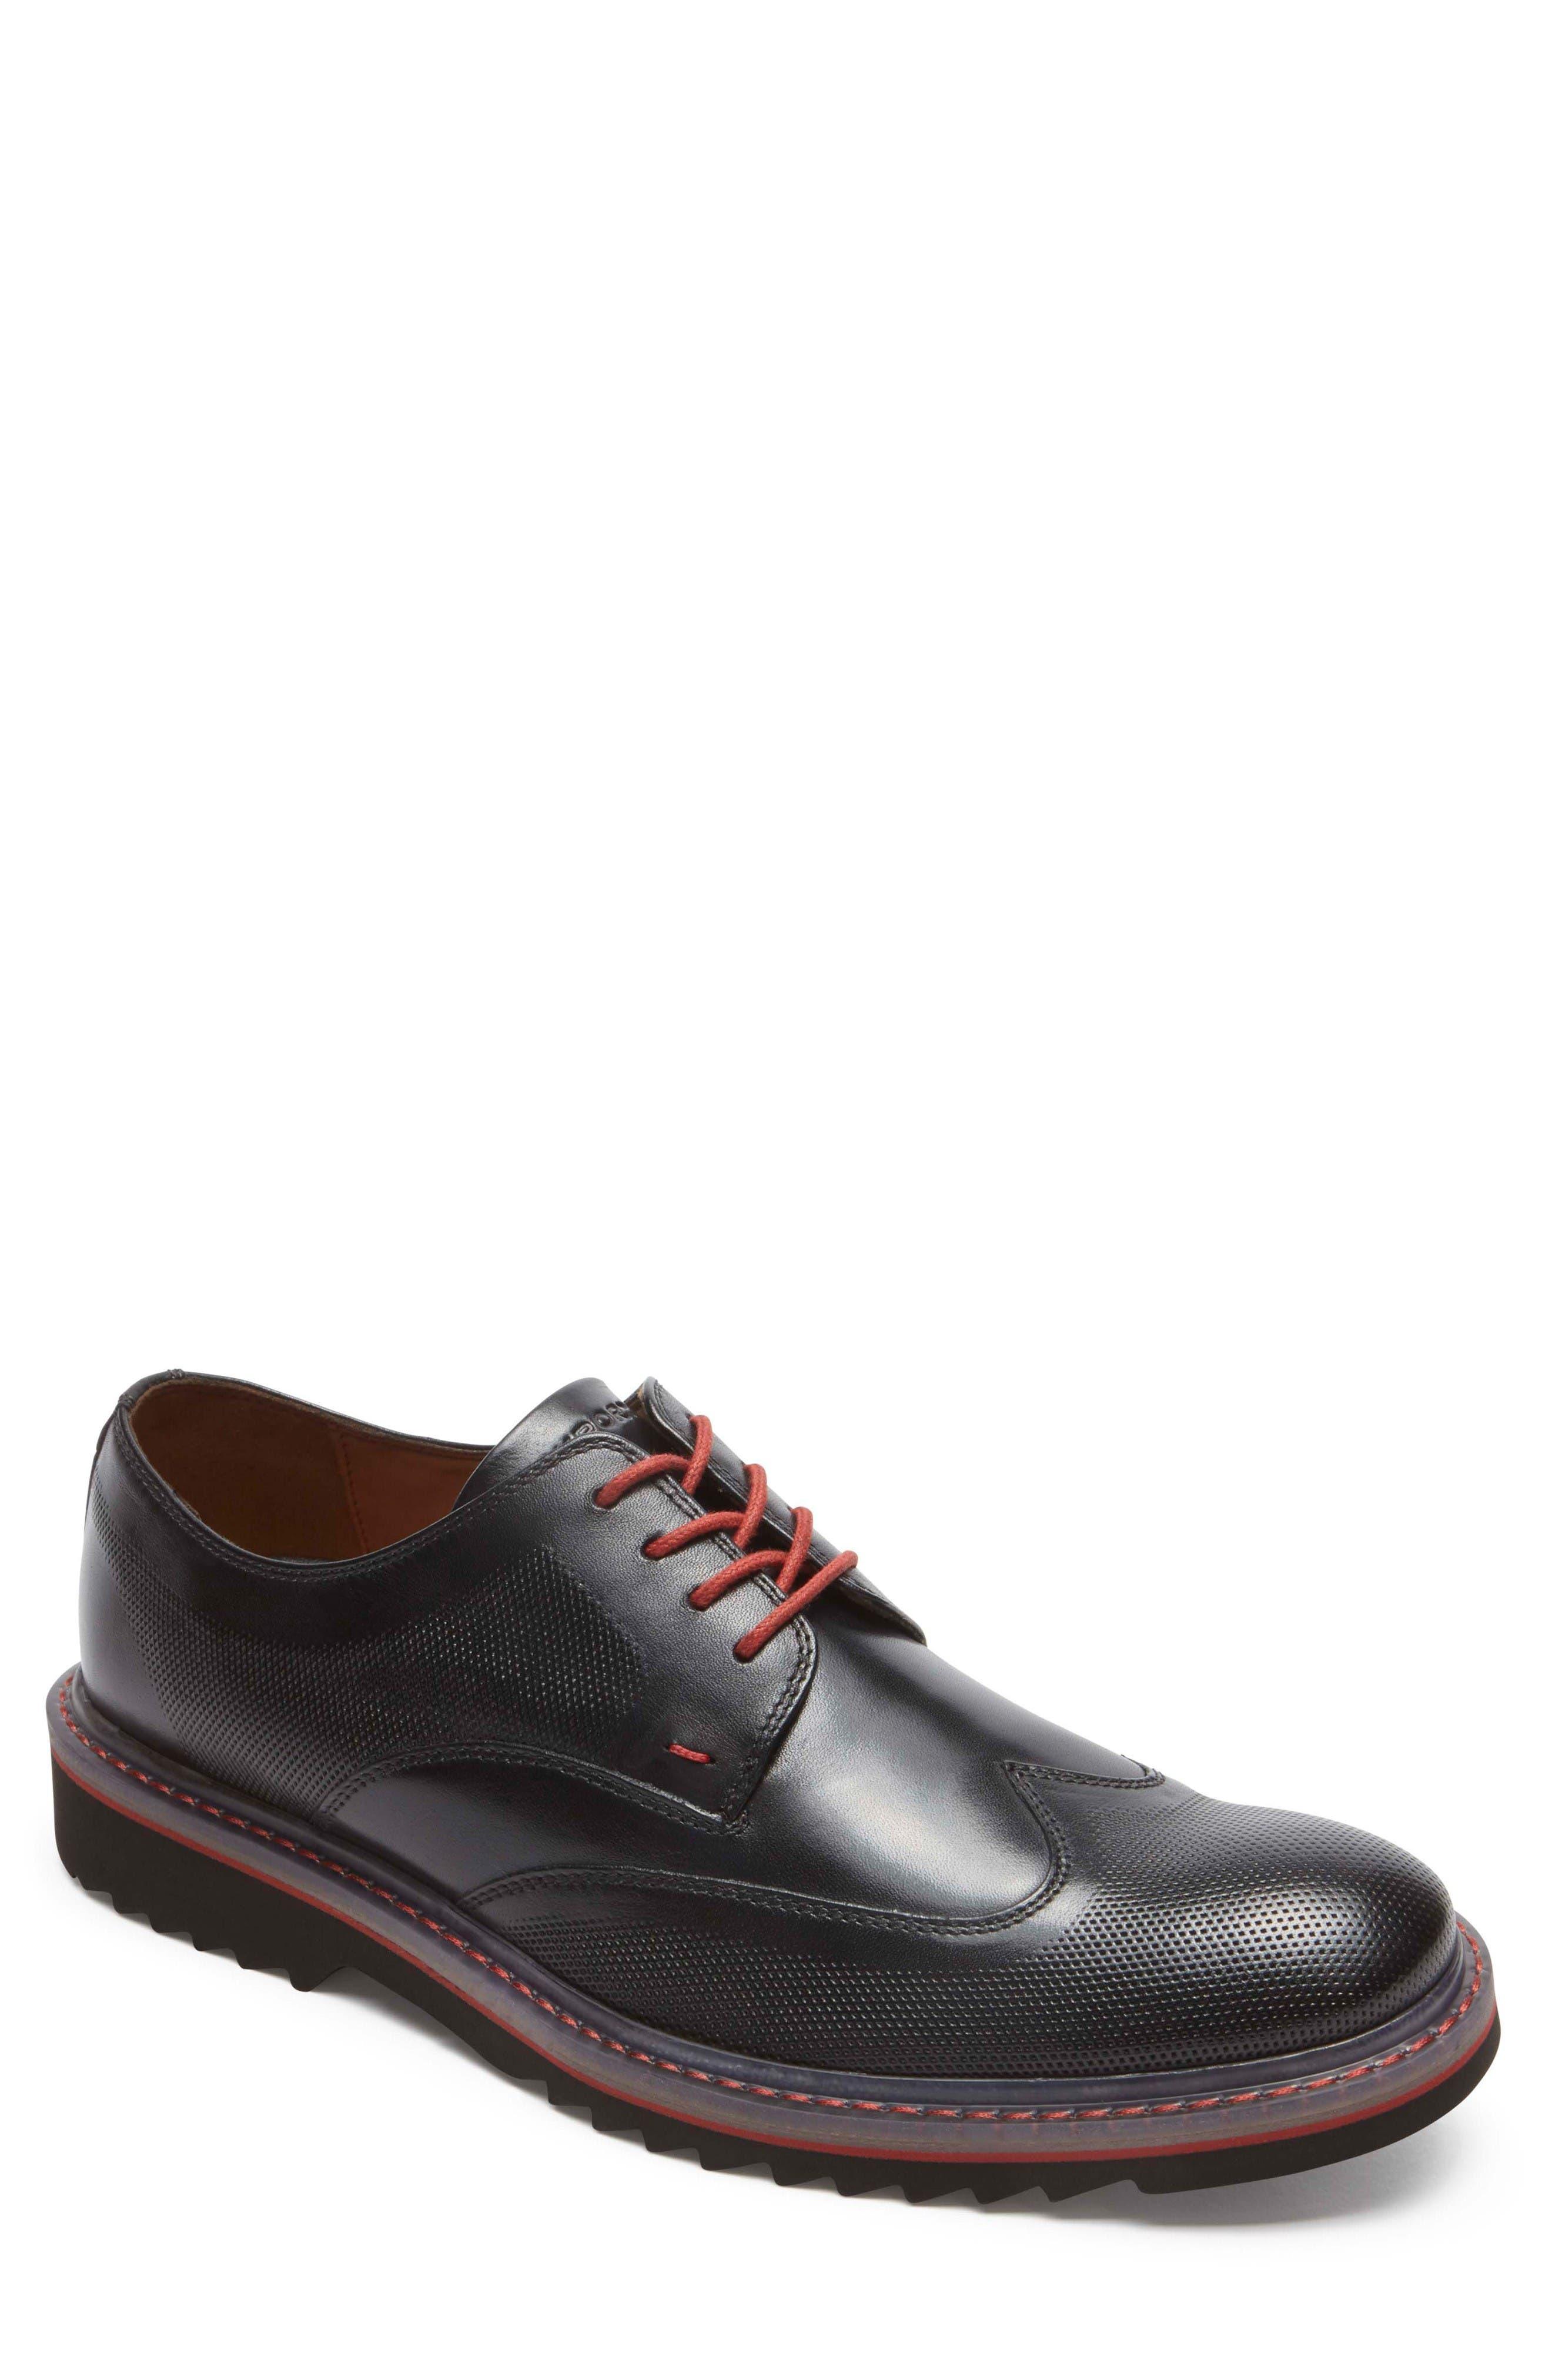 Jaxson Wingtip,                         Main,                         color, Black Leather